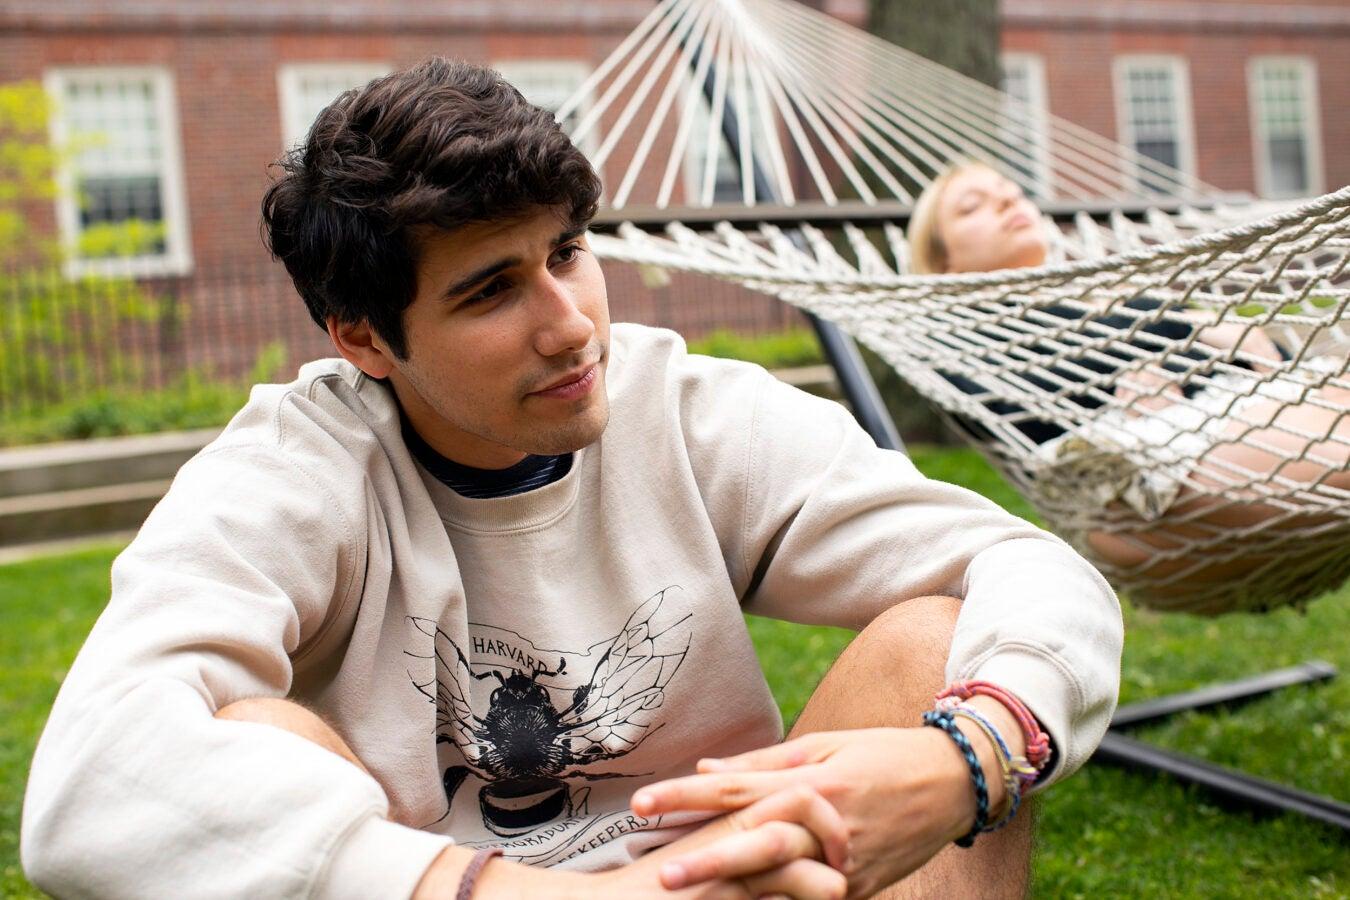 Noah Fanous in the Quincy House courtyard